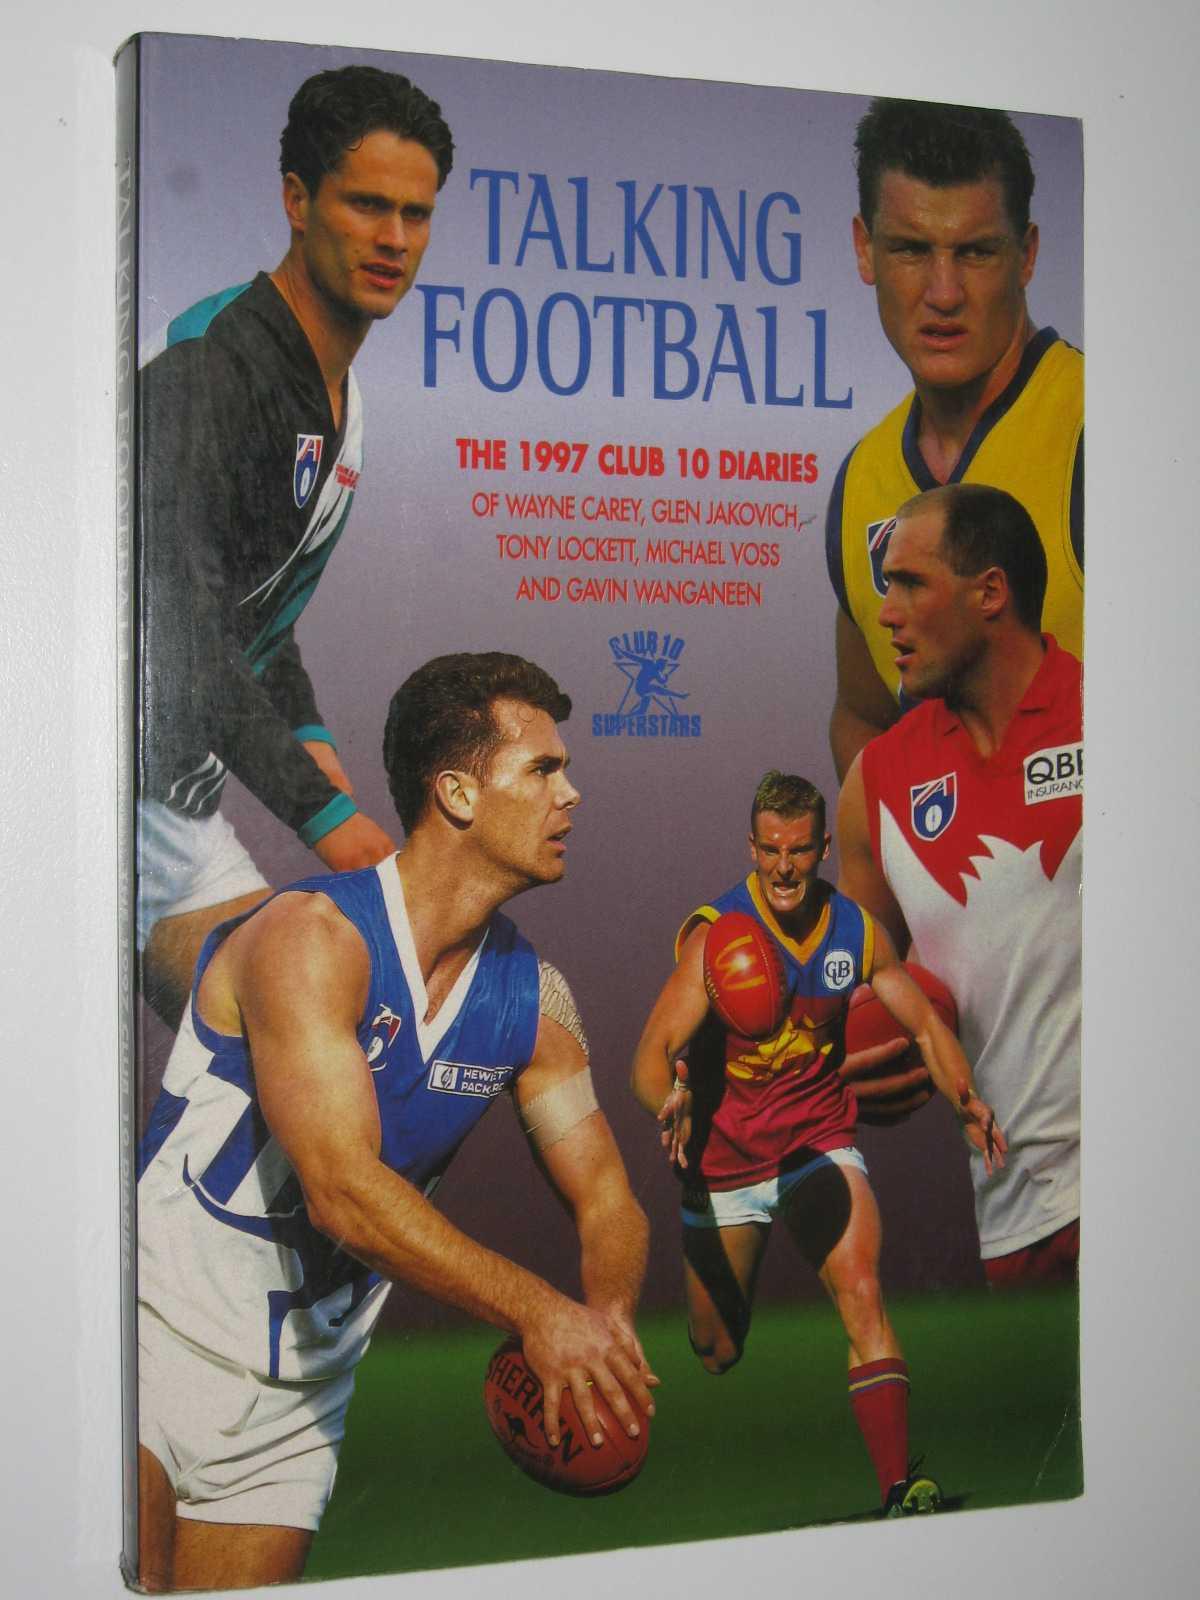 Talking Football : The 1997 Club 10 Diaries of Wayne Carey, Glen Jakovich, Tony Lockett, Michael Voss and Gavin Wanganeen, Christison, Darren (edited)